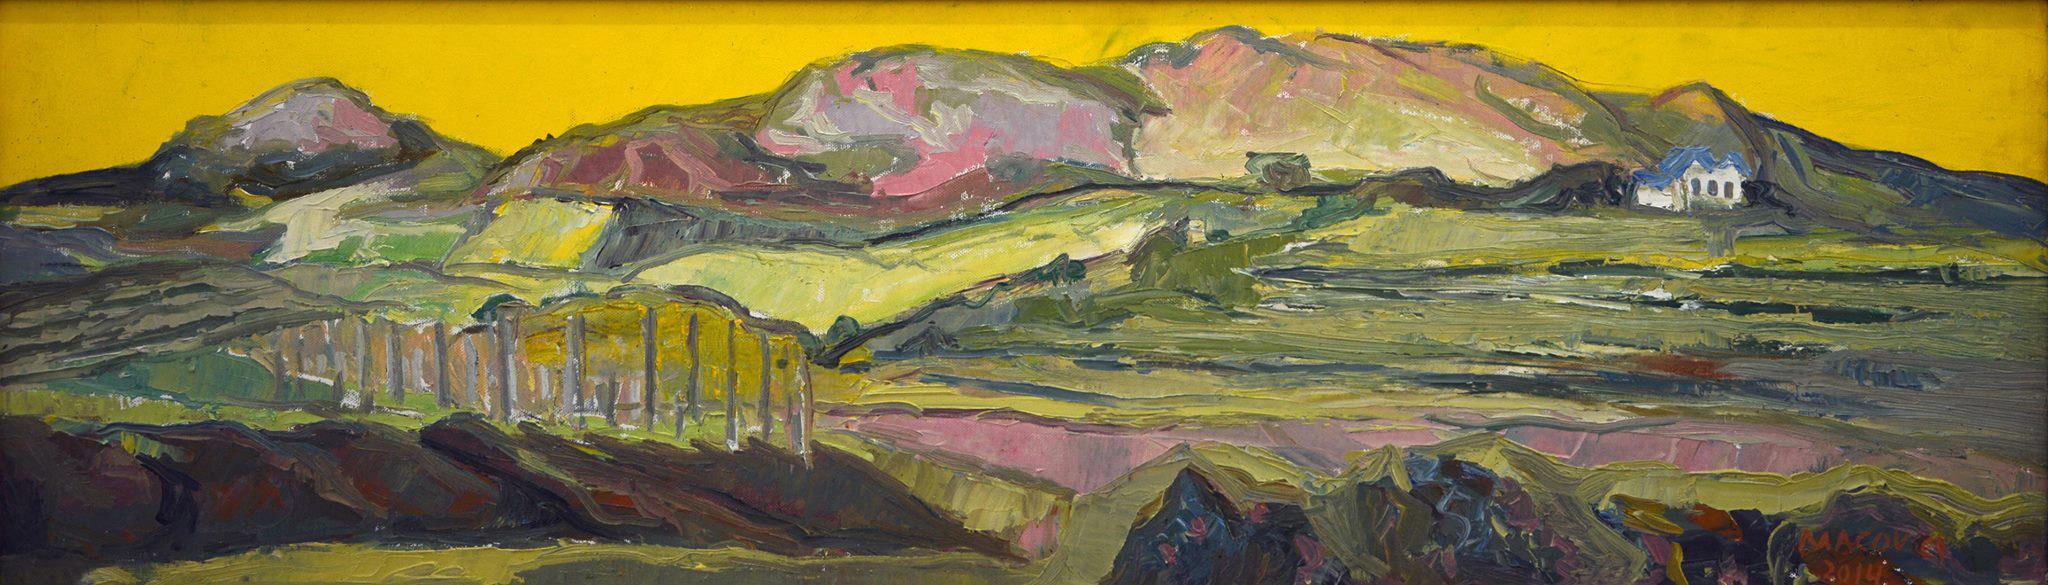 Tohani II, pictor Dumitru Macovei